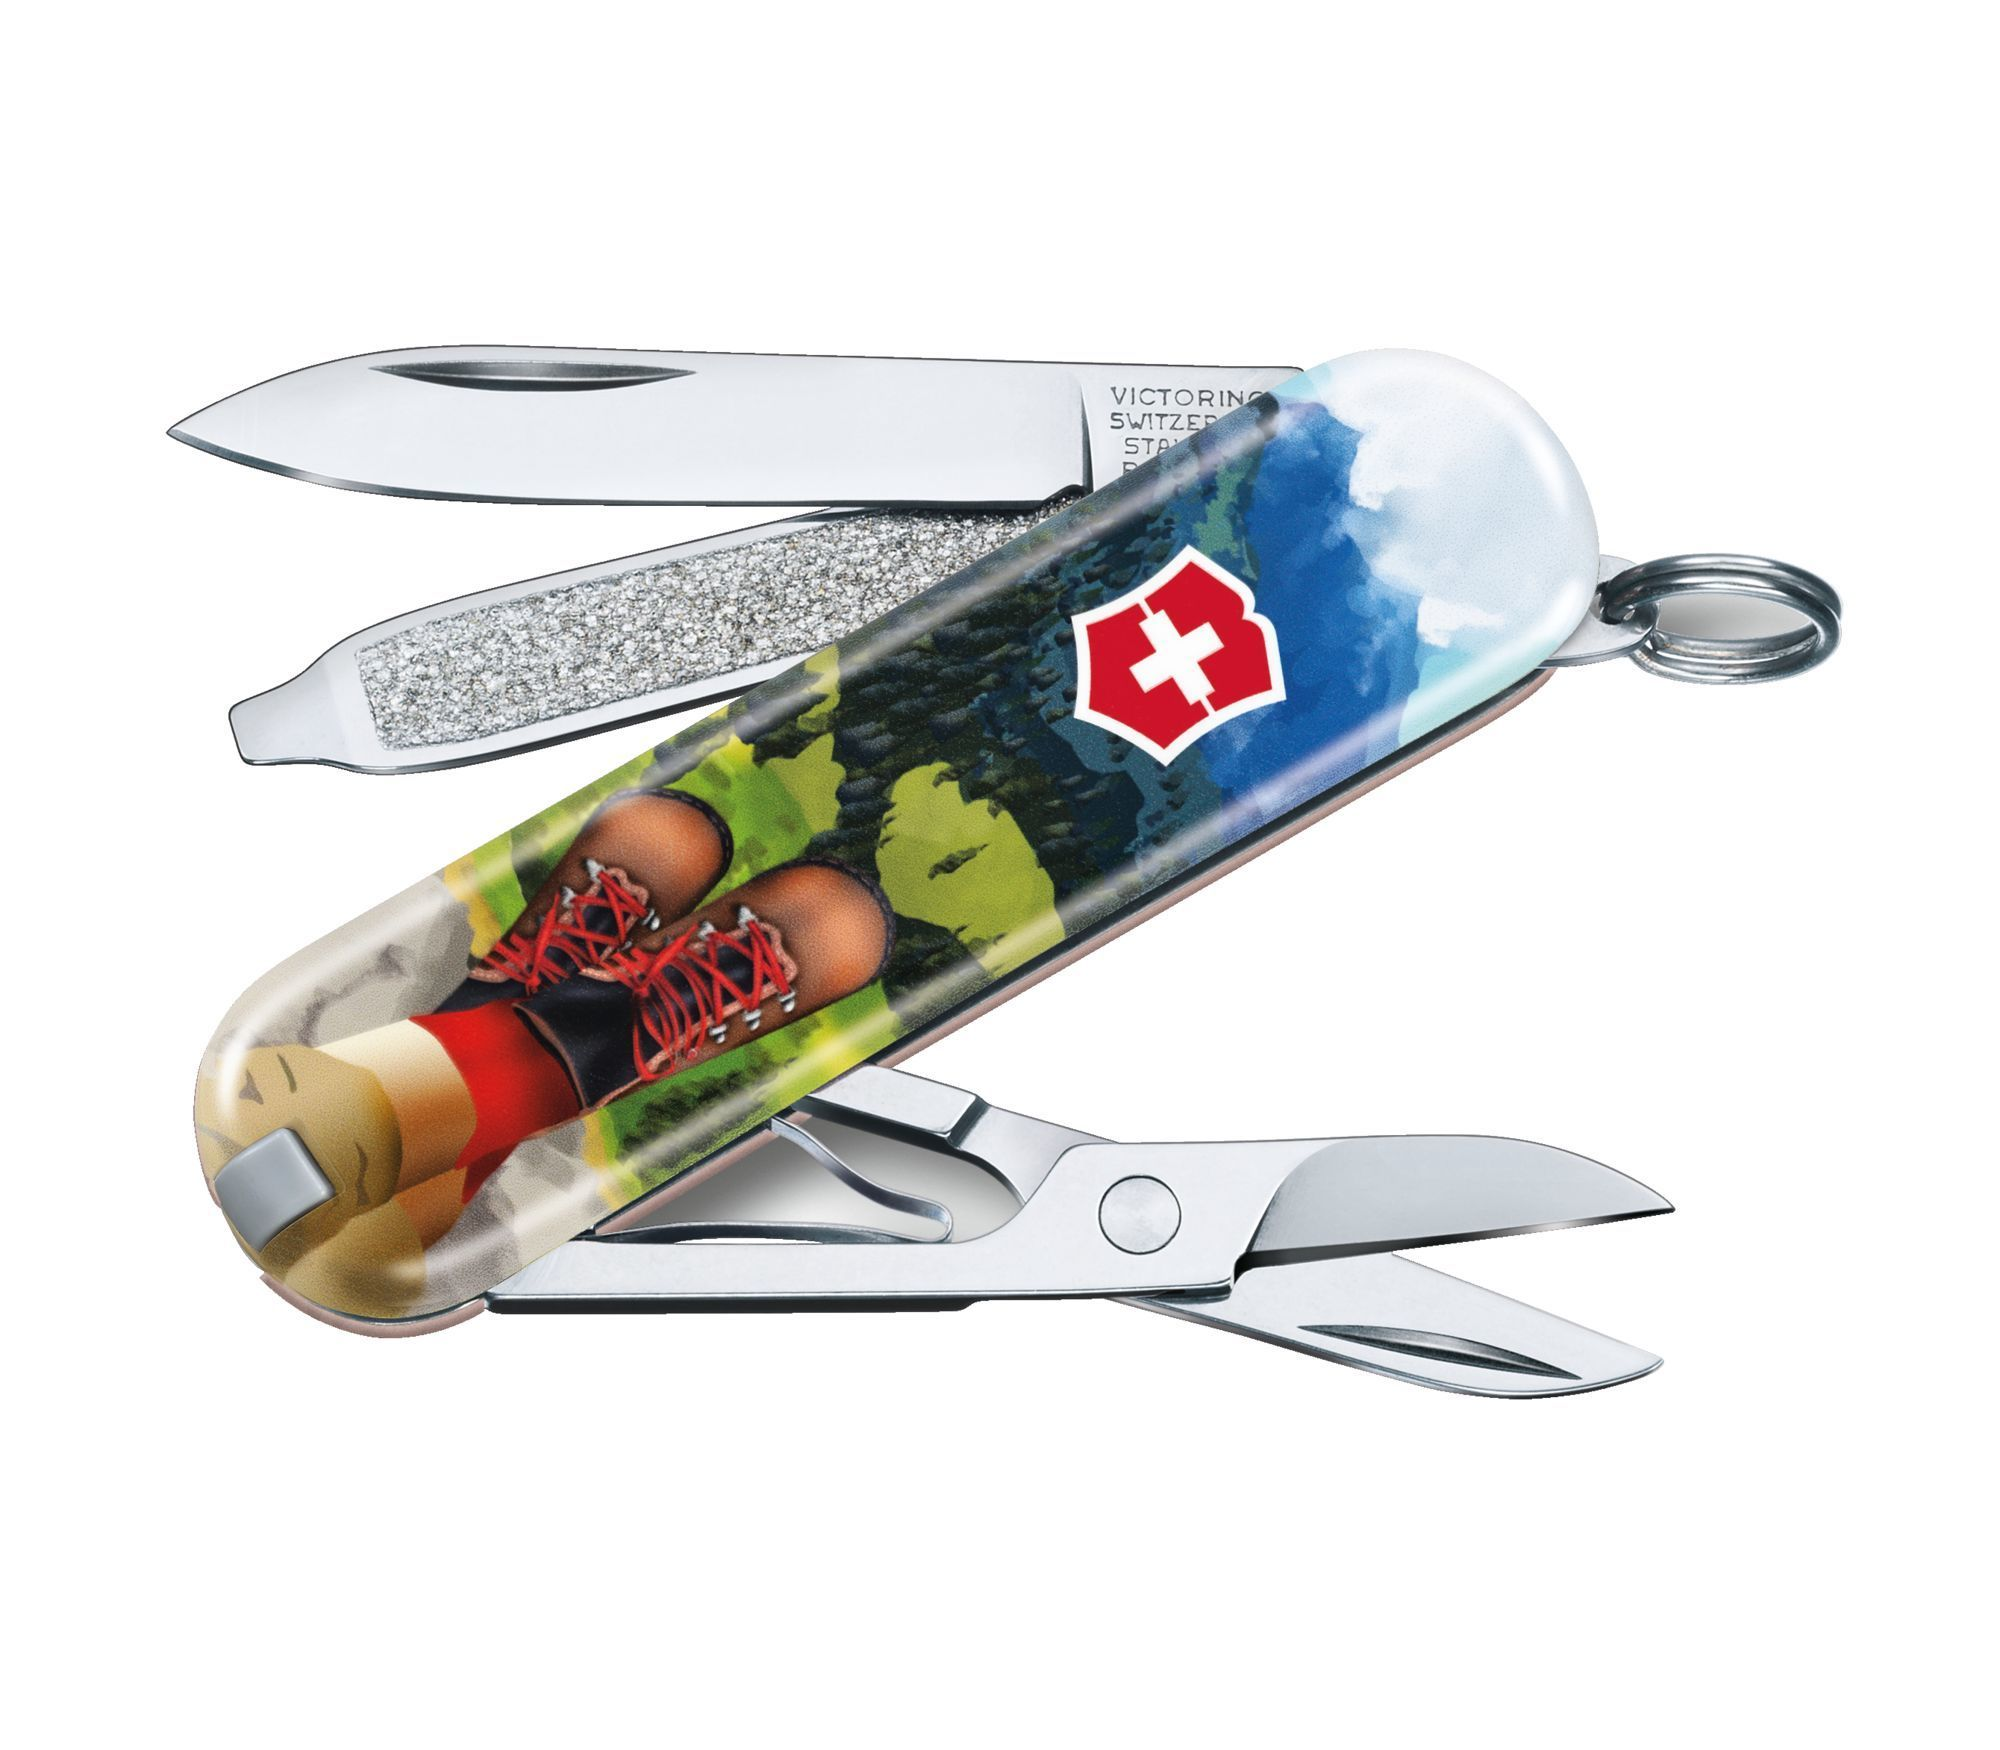 Складной нож Victorinox Classic LE2020 I Love Hiking, 58 мм 7 функций